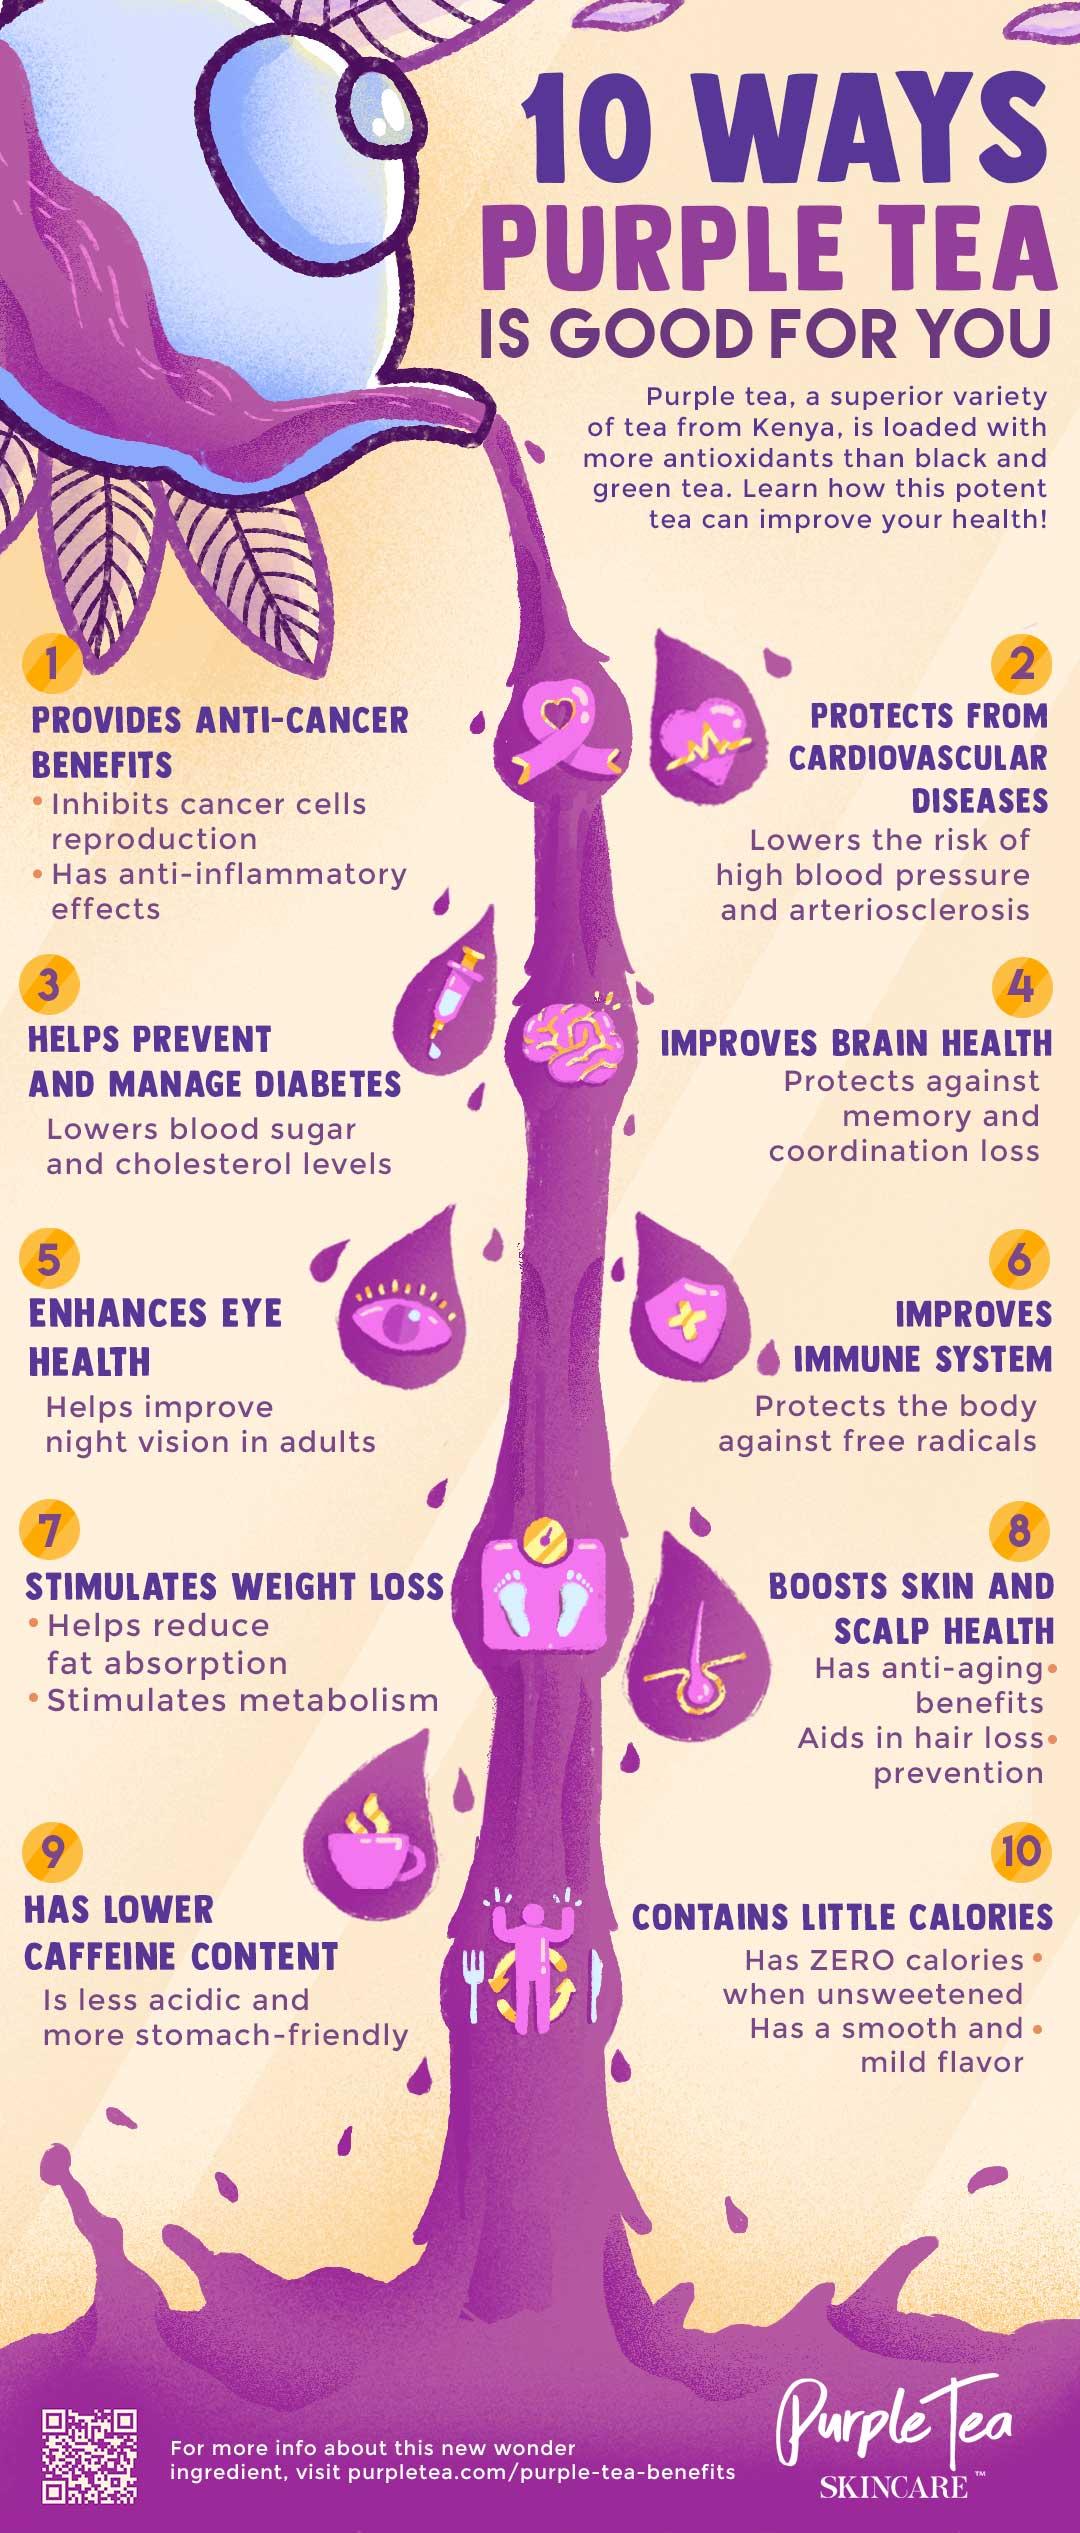 10 Ways Purple Tea Is Good For You